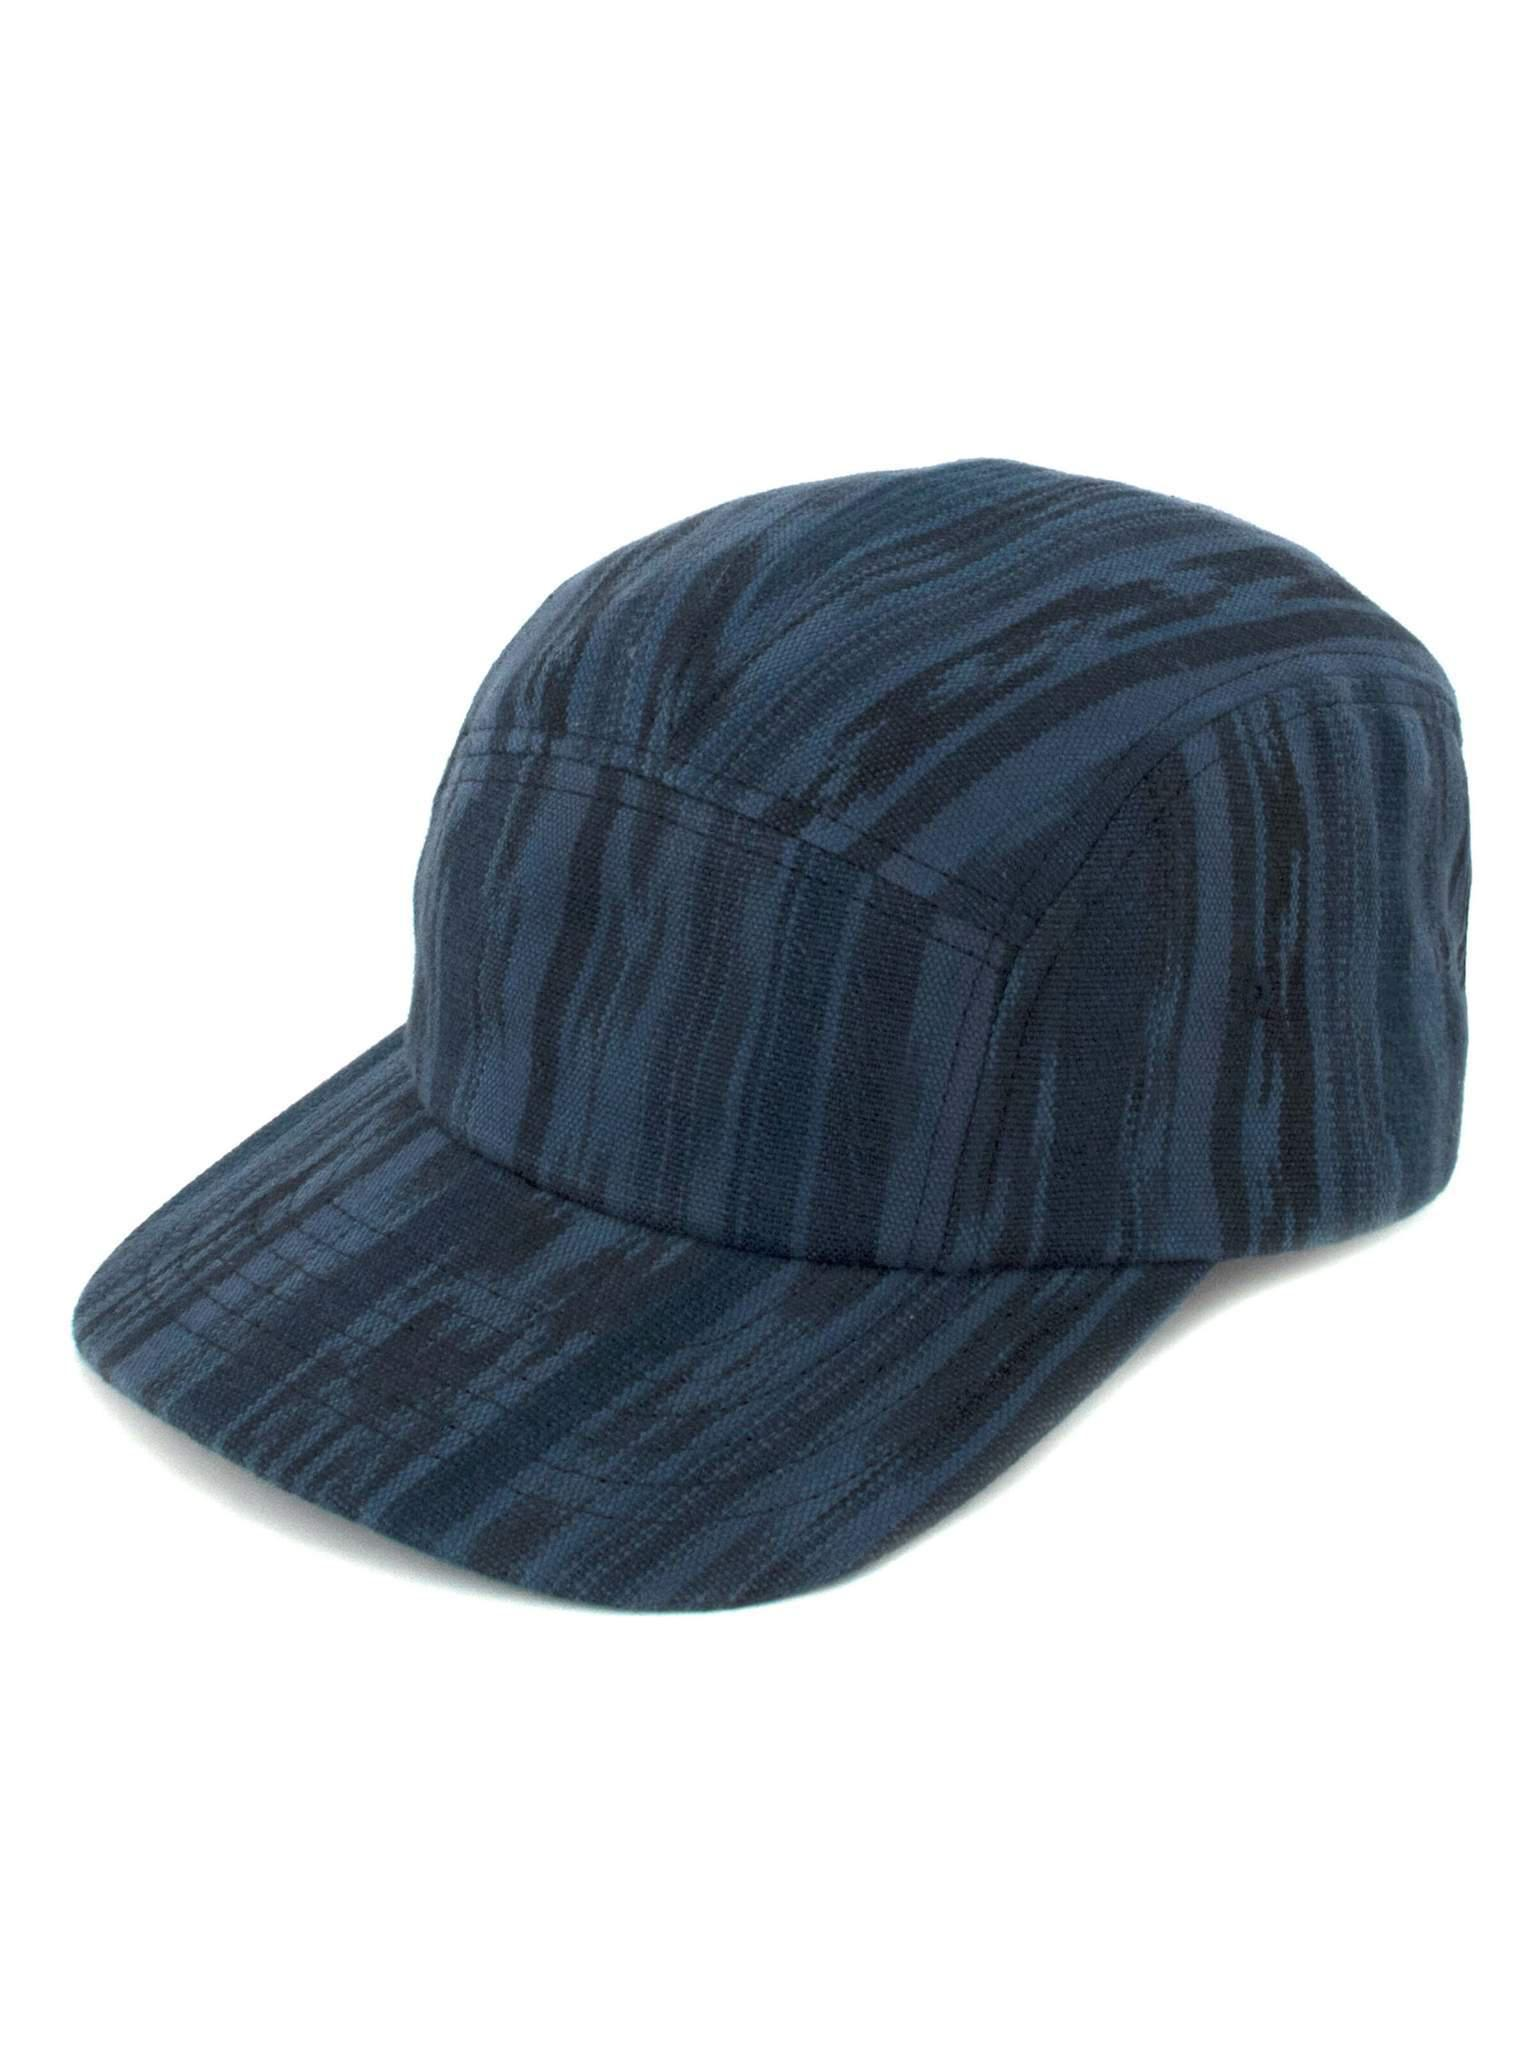 5c378f5ccd9 Lyst - Mollusk Ikat Hat in Blue for Men